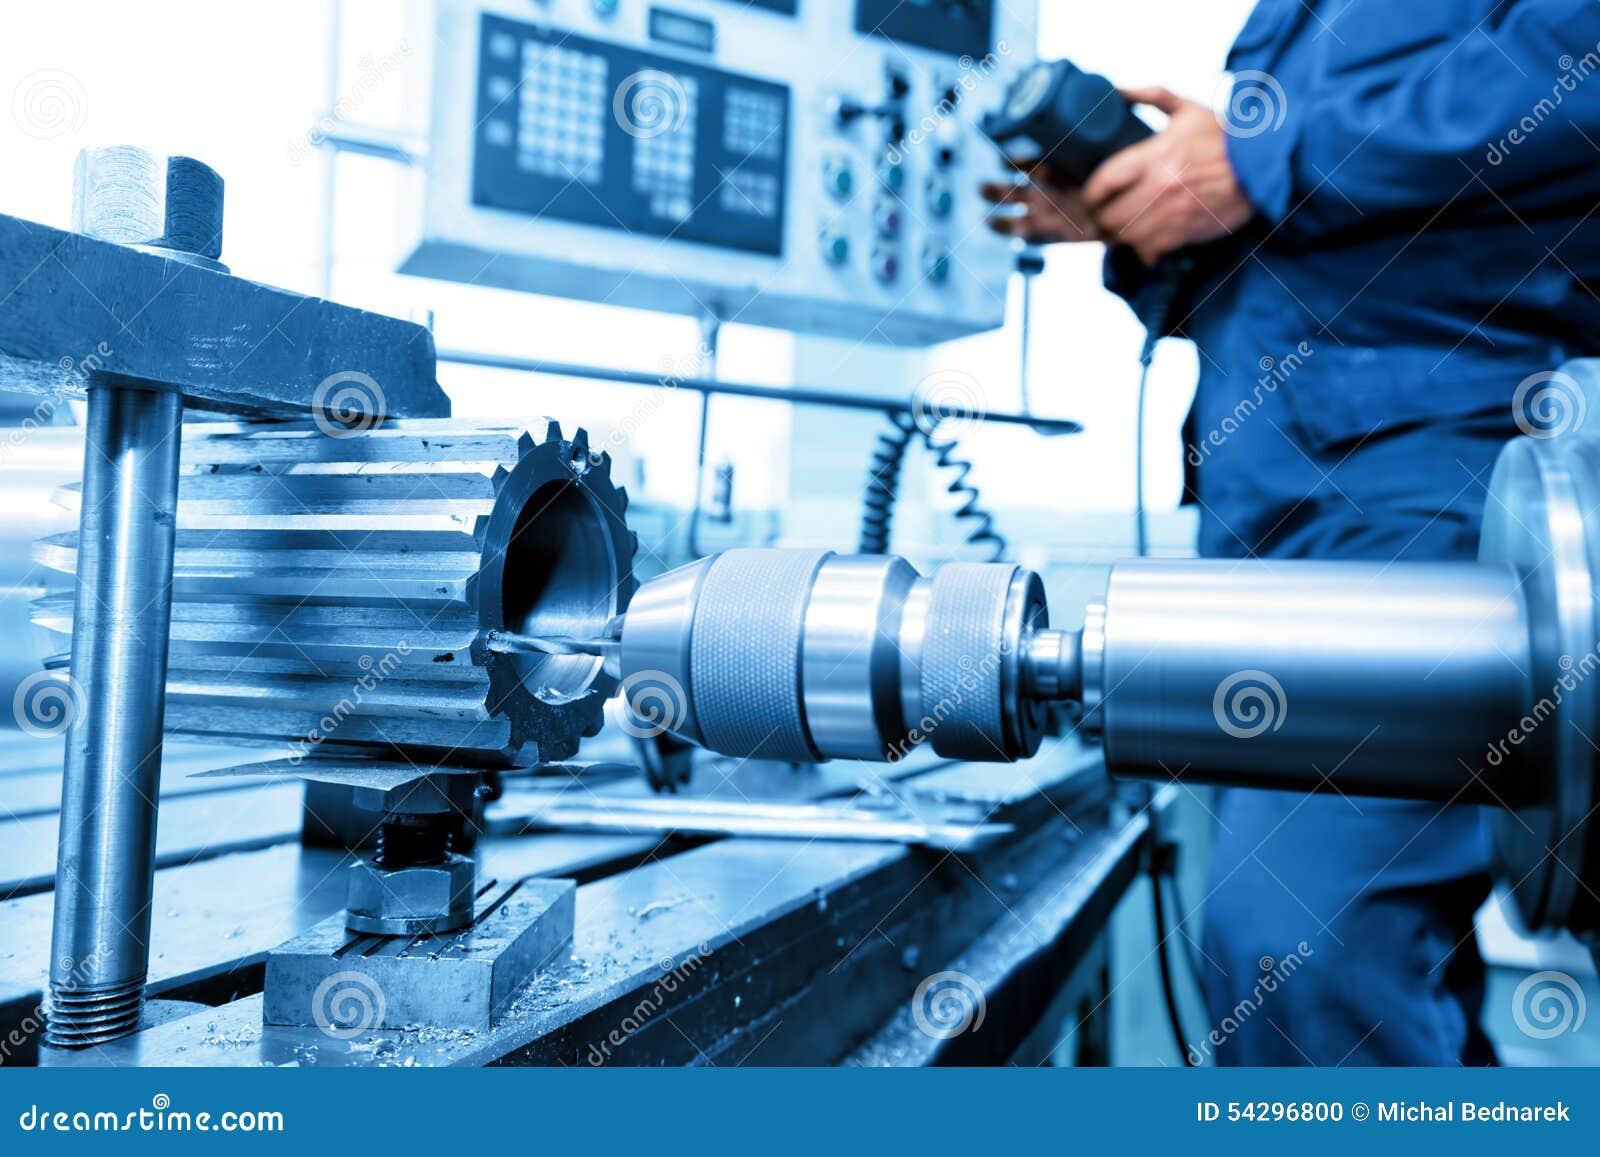 Mens die CNC boor en boring machine in werking stellen Industrie